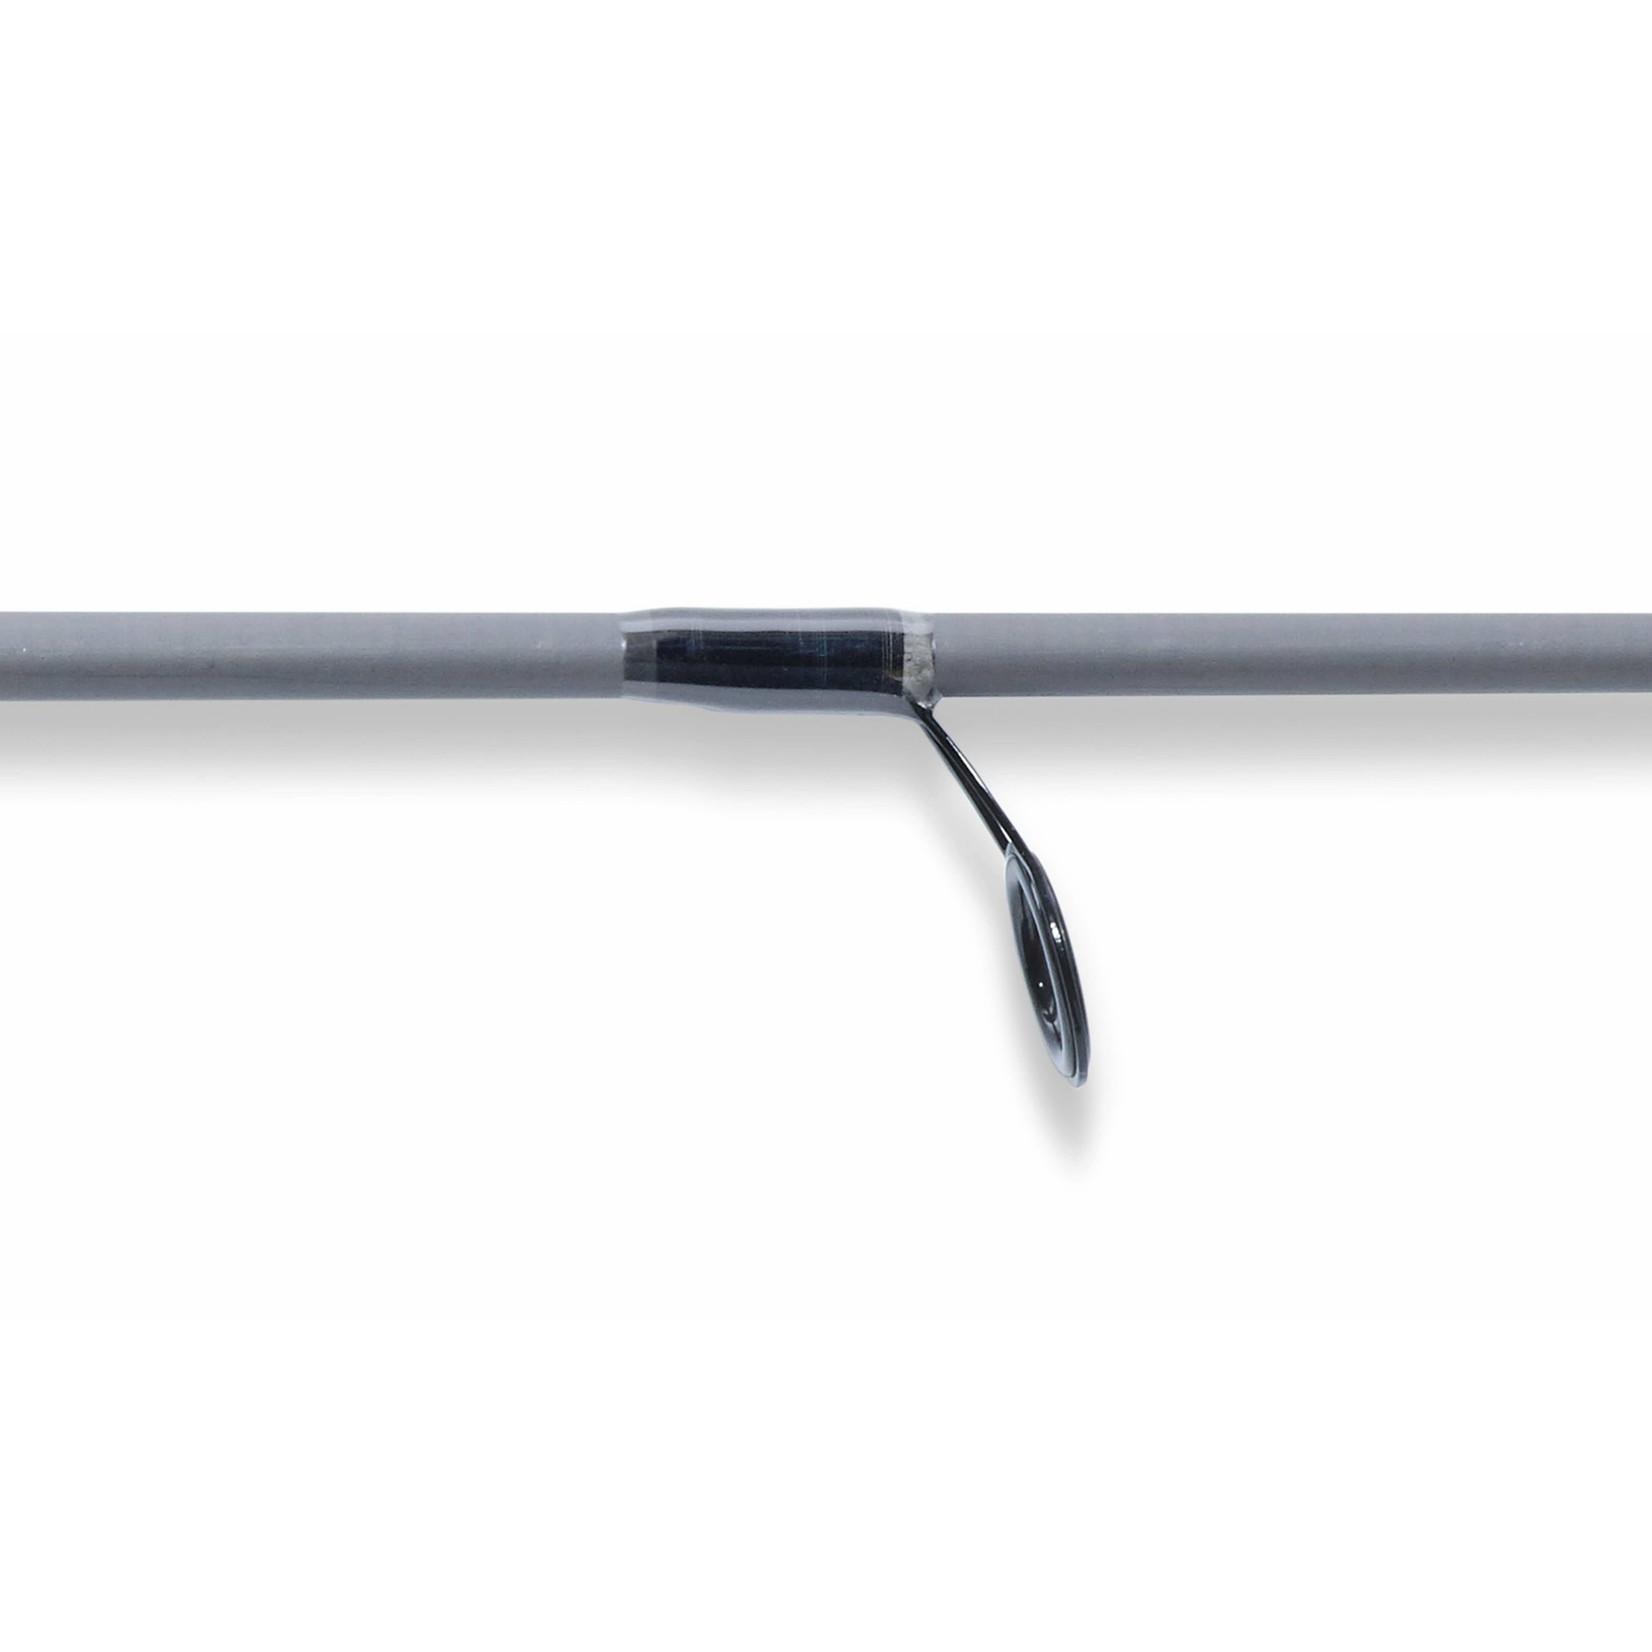 St.Croix St-Croix Bass X Spinning Rod